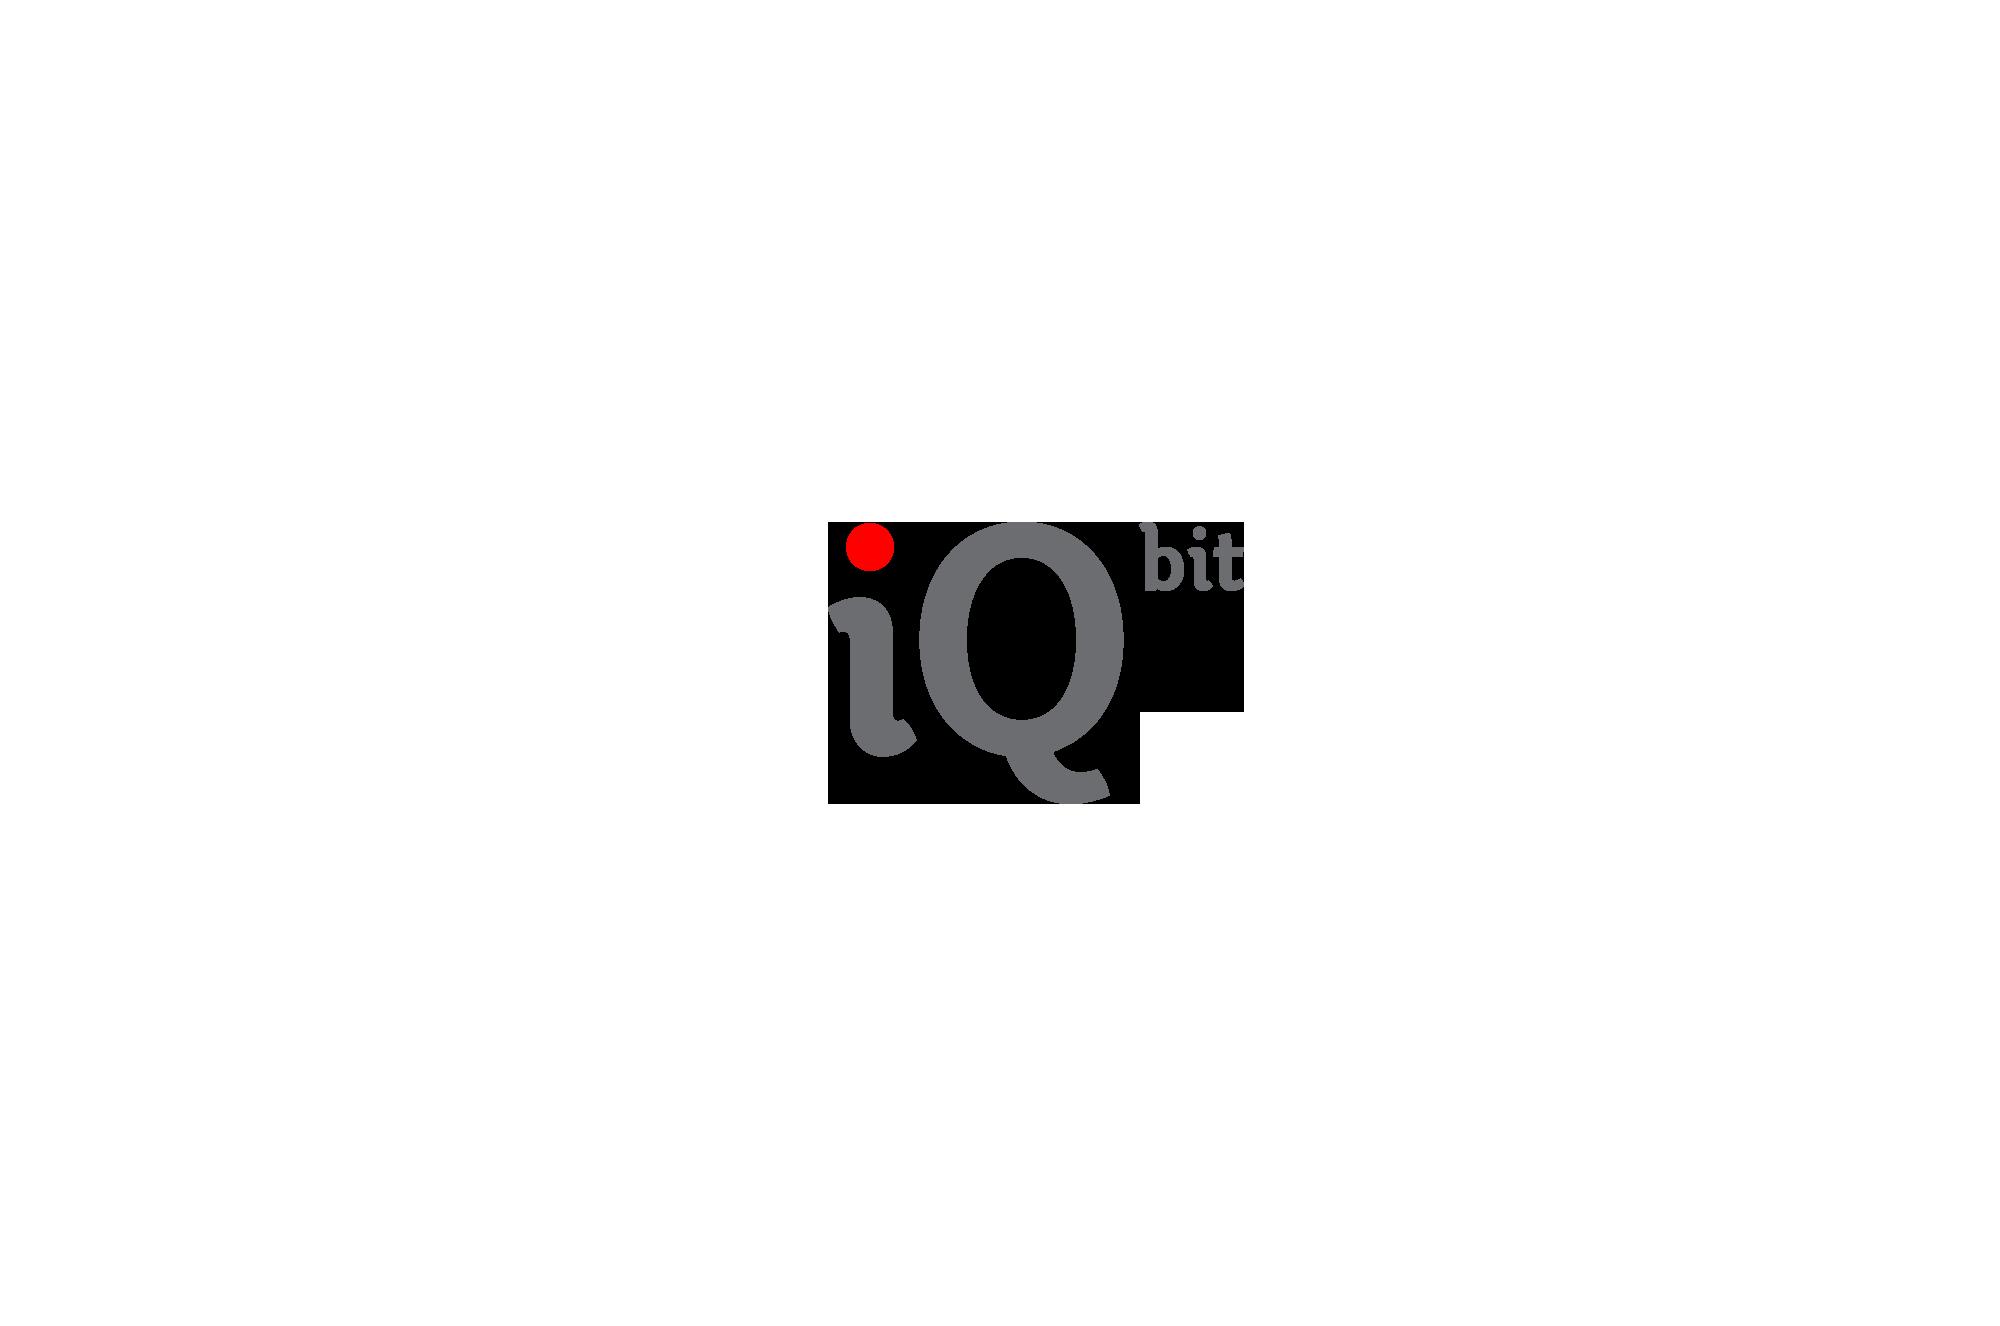 raniev-rod-alvarez-diseño-gráfico-queretaro-iqbit-15-logo